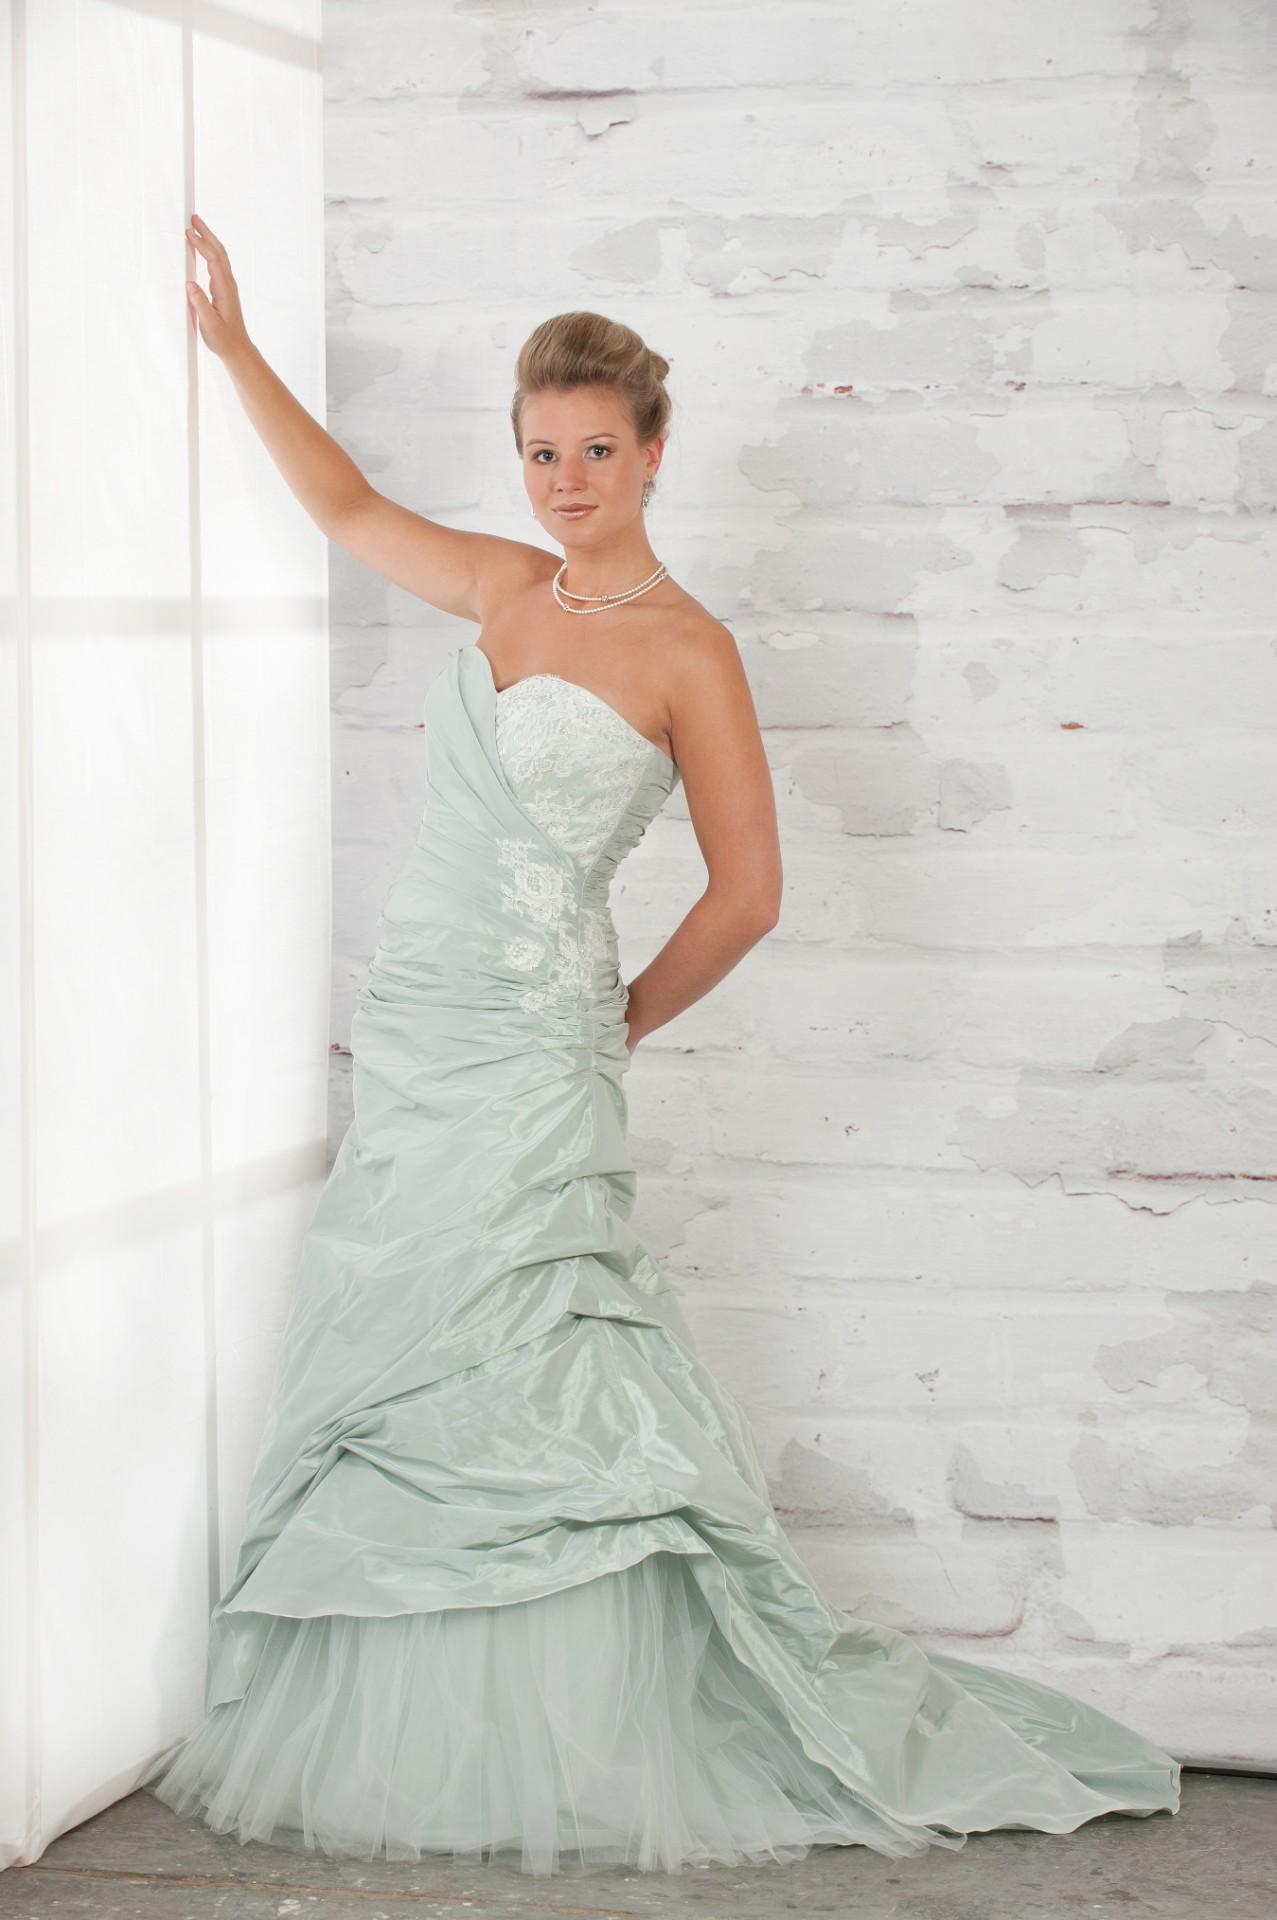 Bruidsmode Apeldoorn